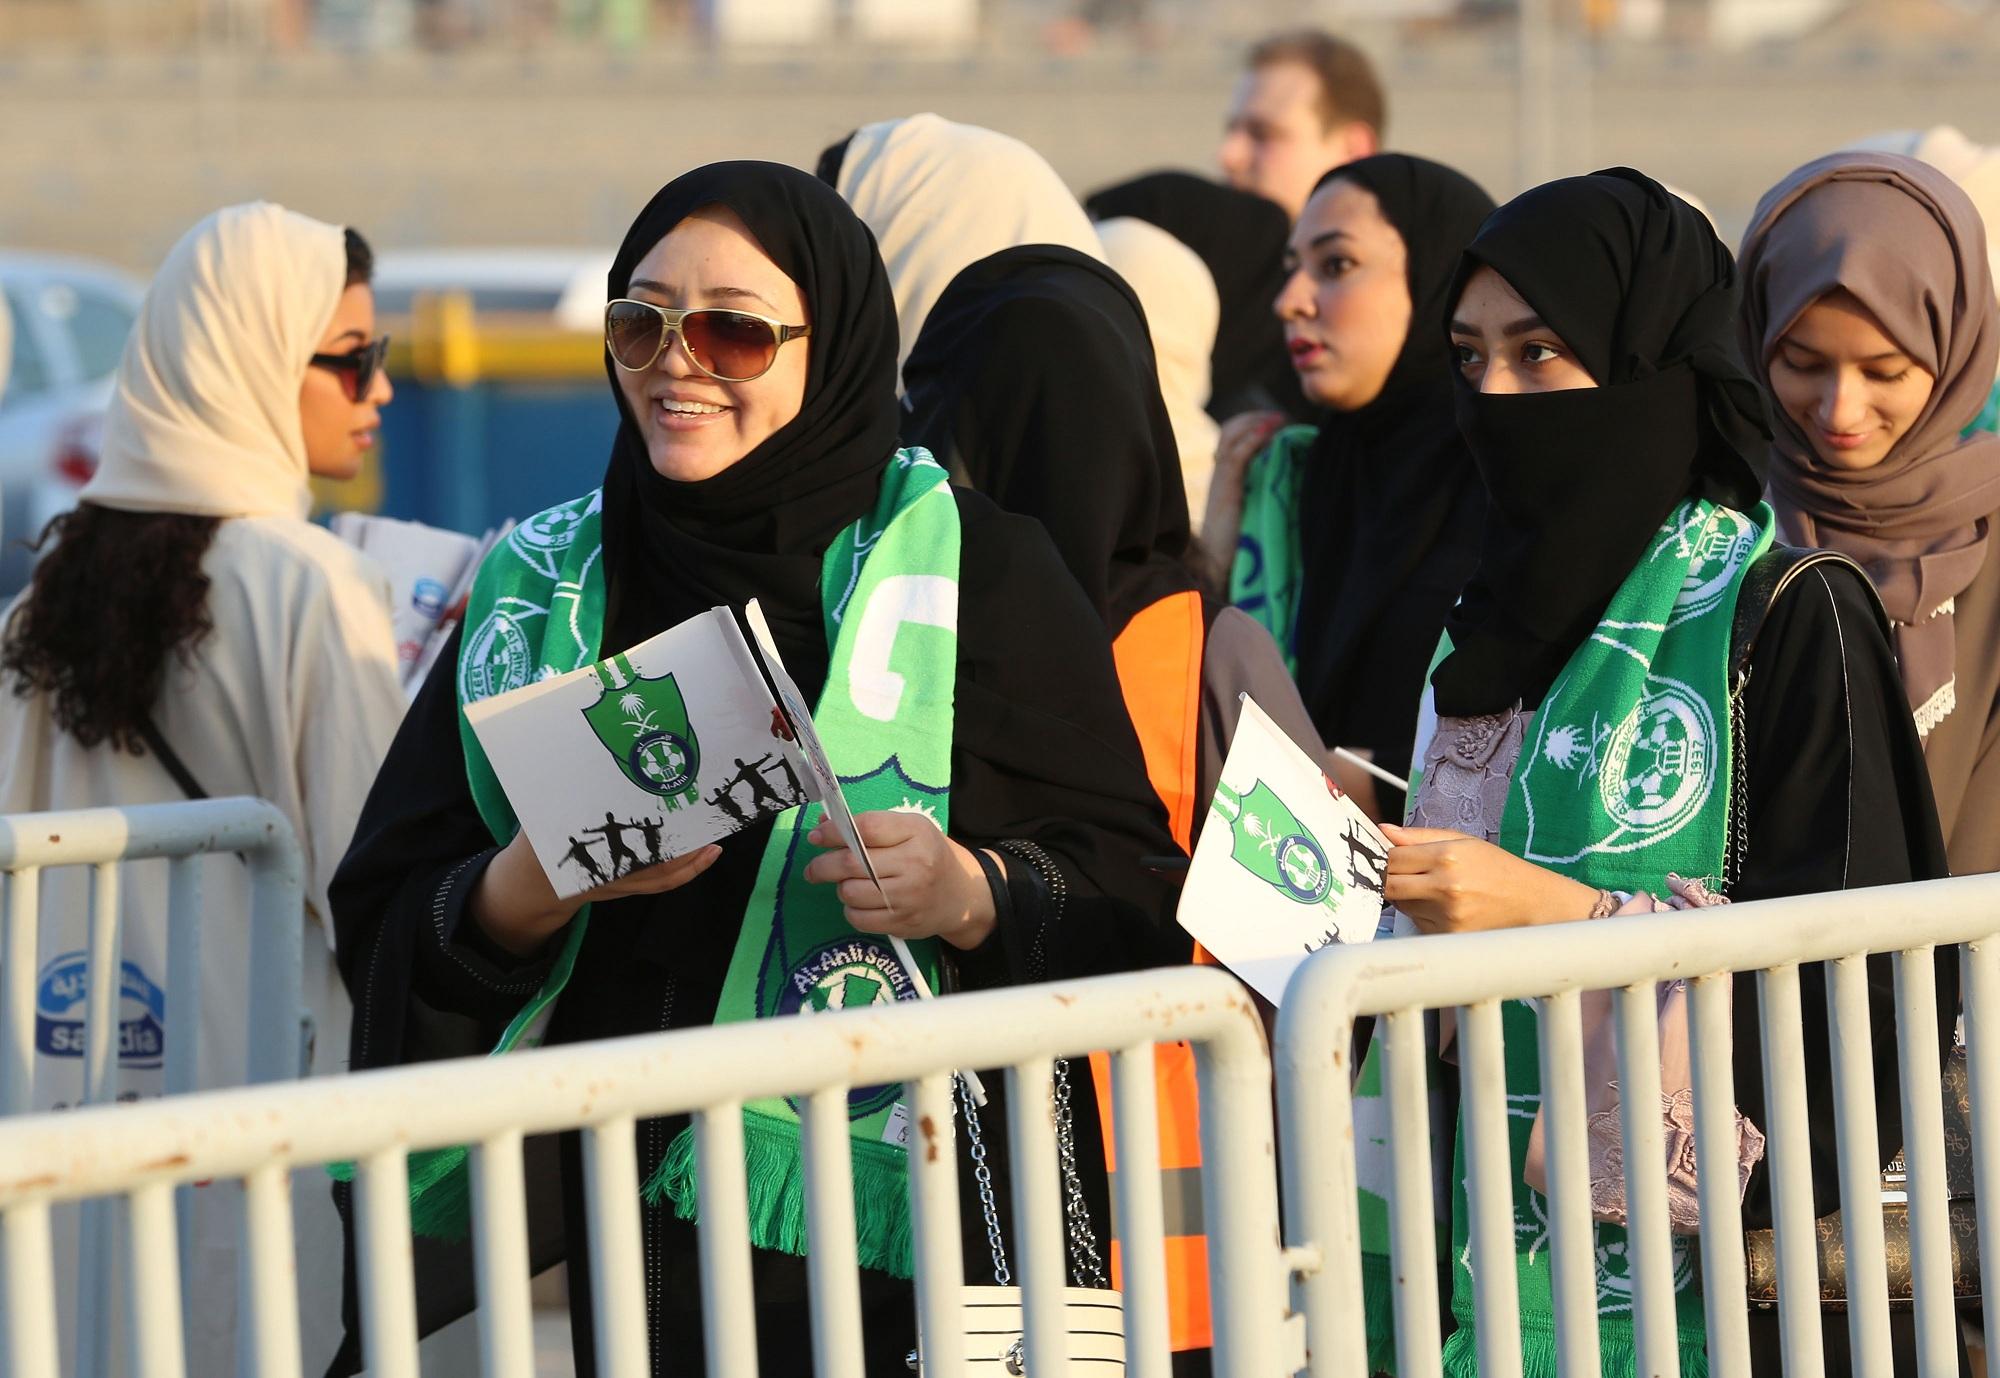 Women entered the stadium through a separate entrance